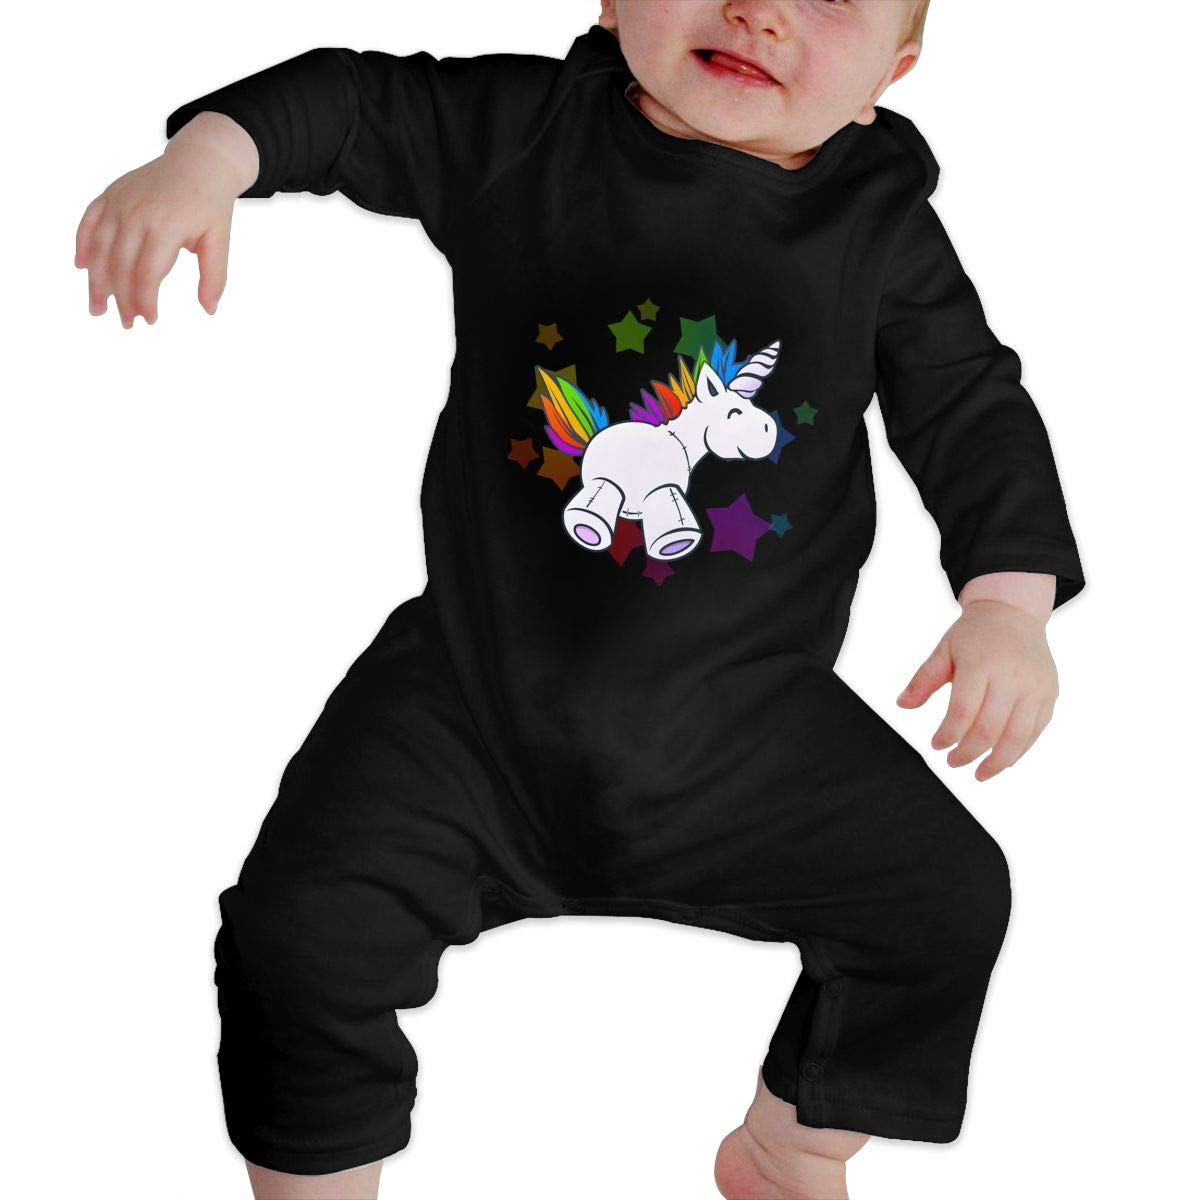 KAYERDELLE Unicorns Long Sleeve Unisex Baby Playsuit for 6-24 Months Boys /& Girls